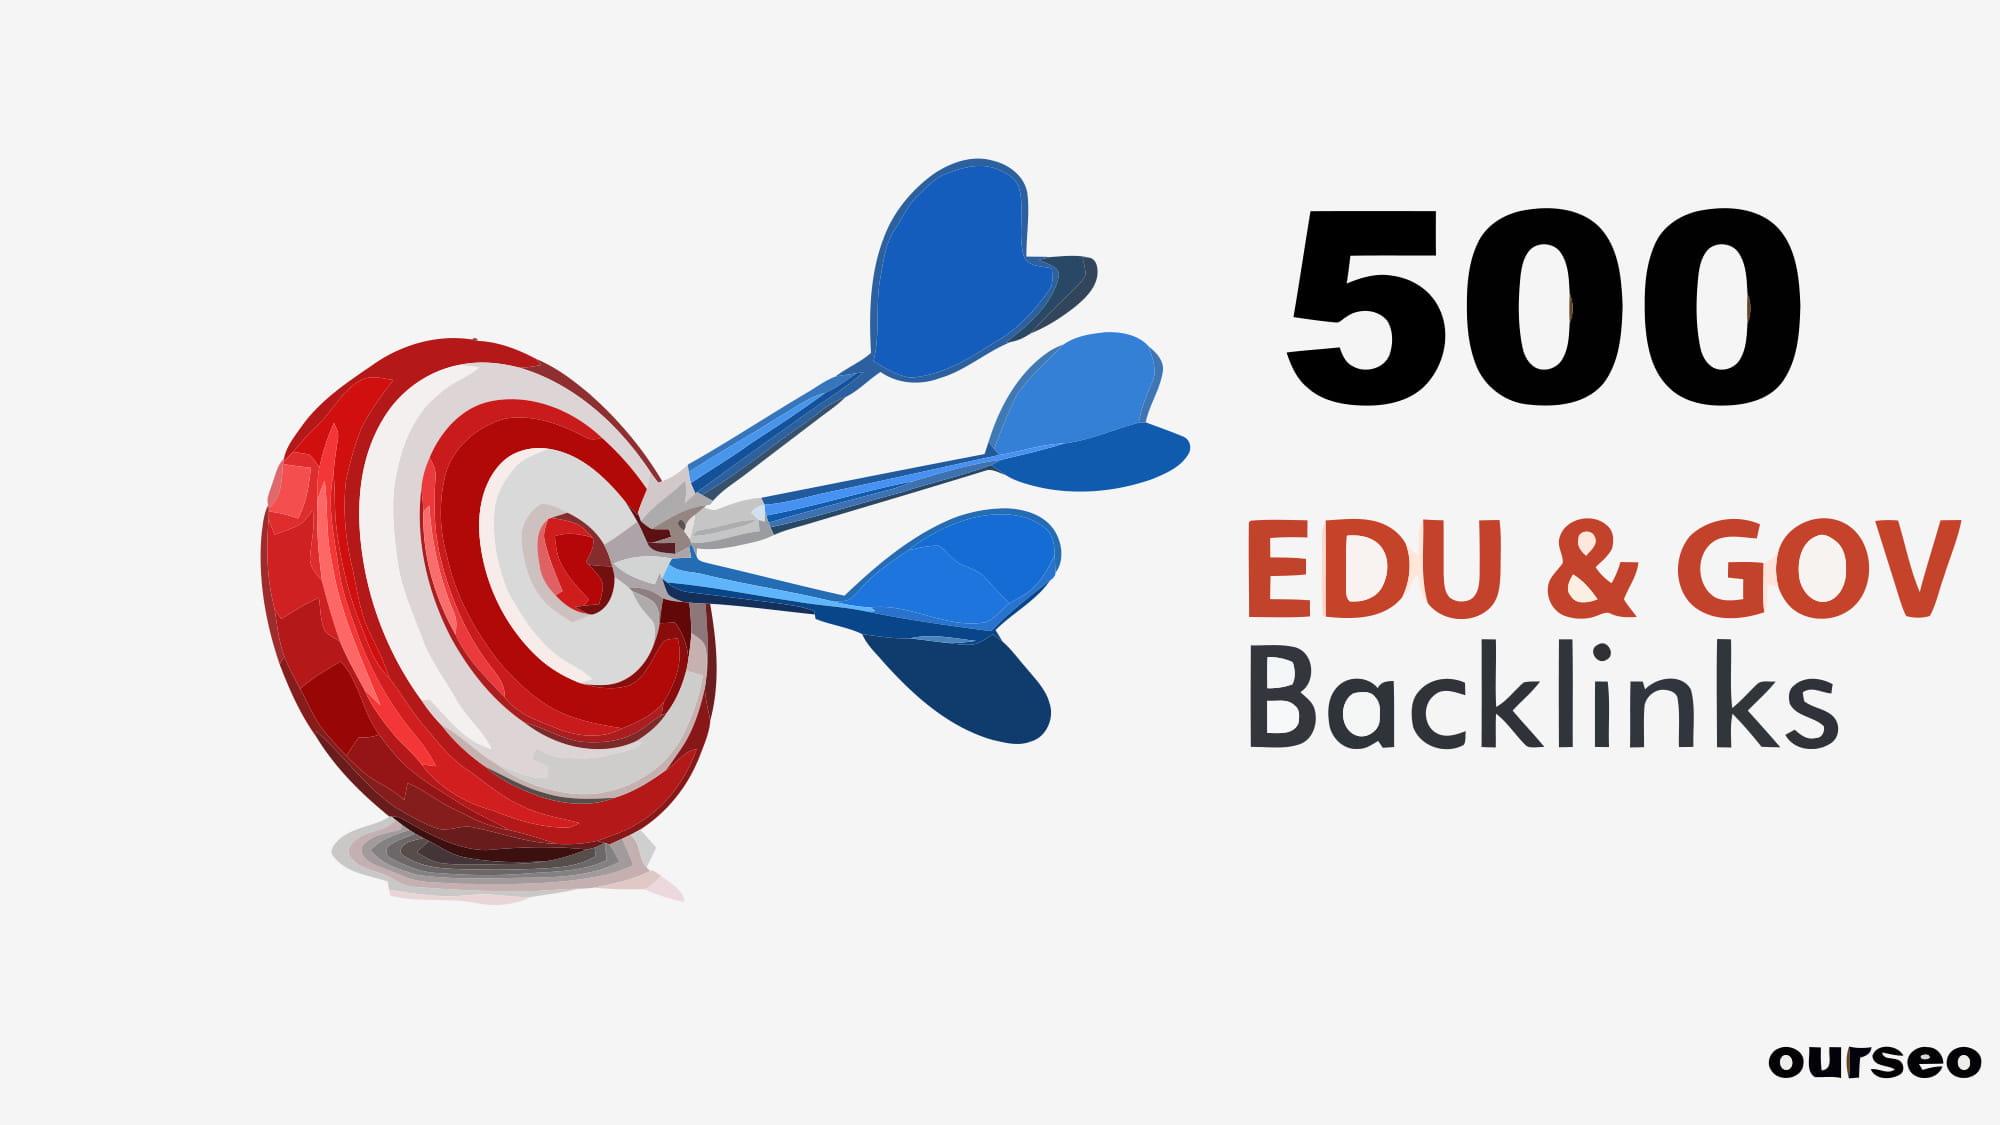 Provide 500 plus edu gov backlinks